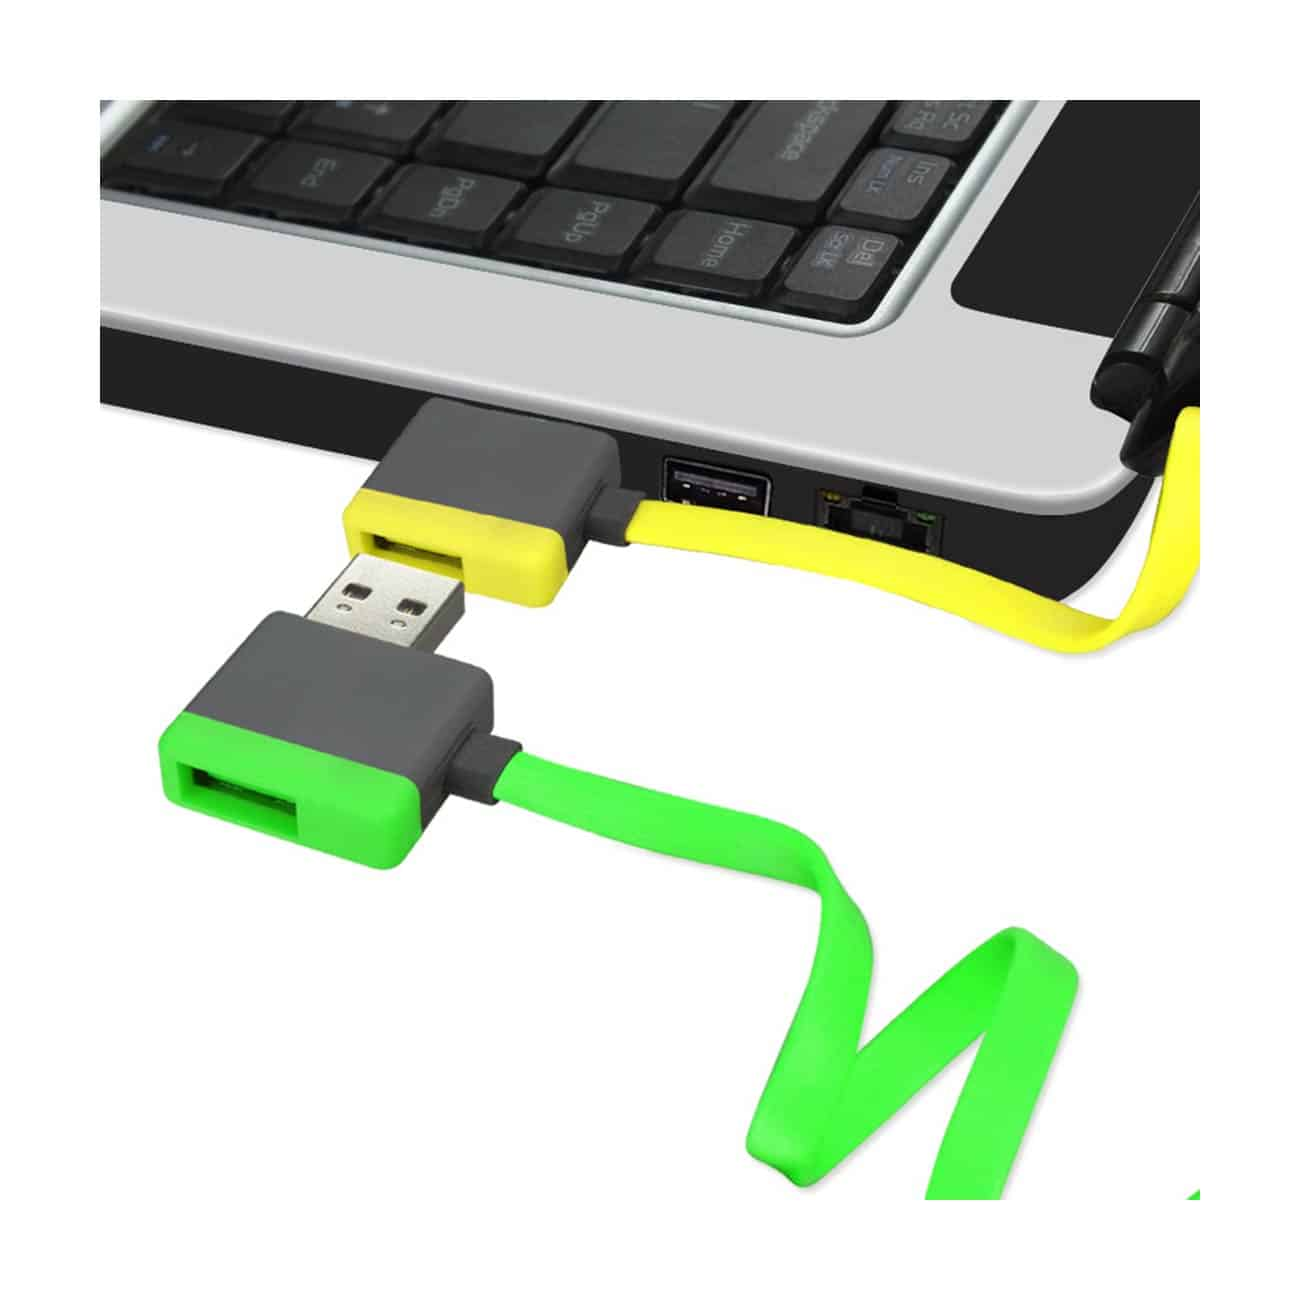 MICRO USB PIGGYBACK FLAT LIBERATOR USB CABLE 3.2FT IN YELLOW